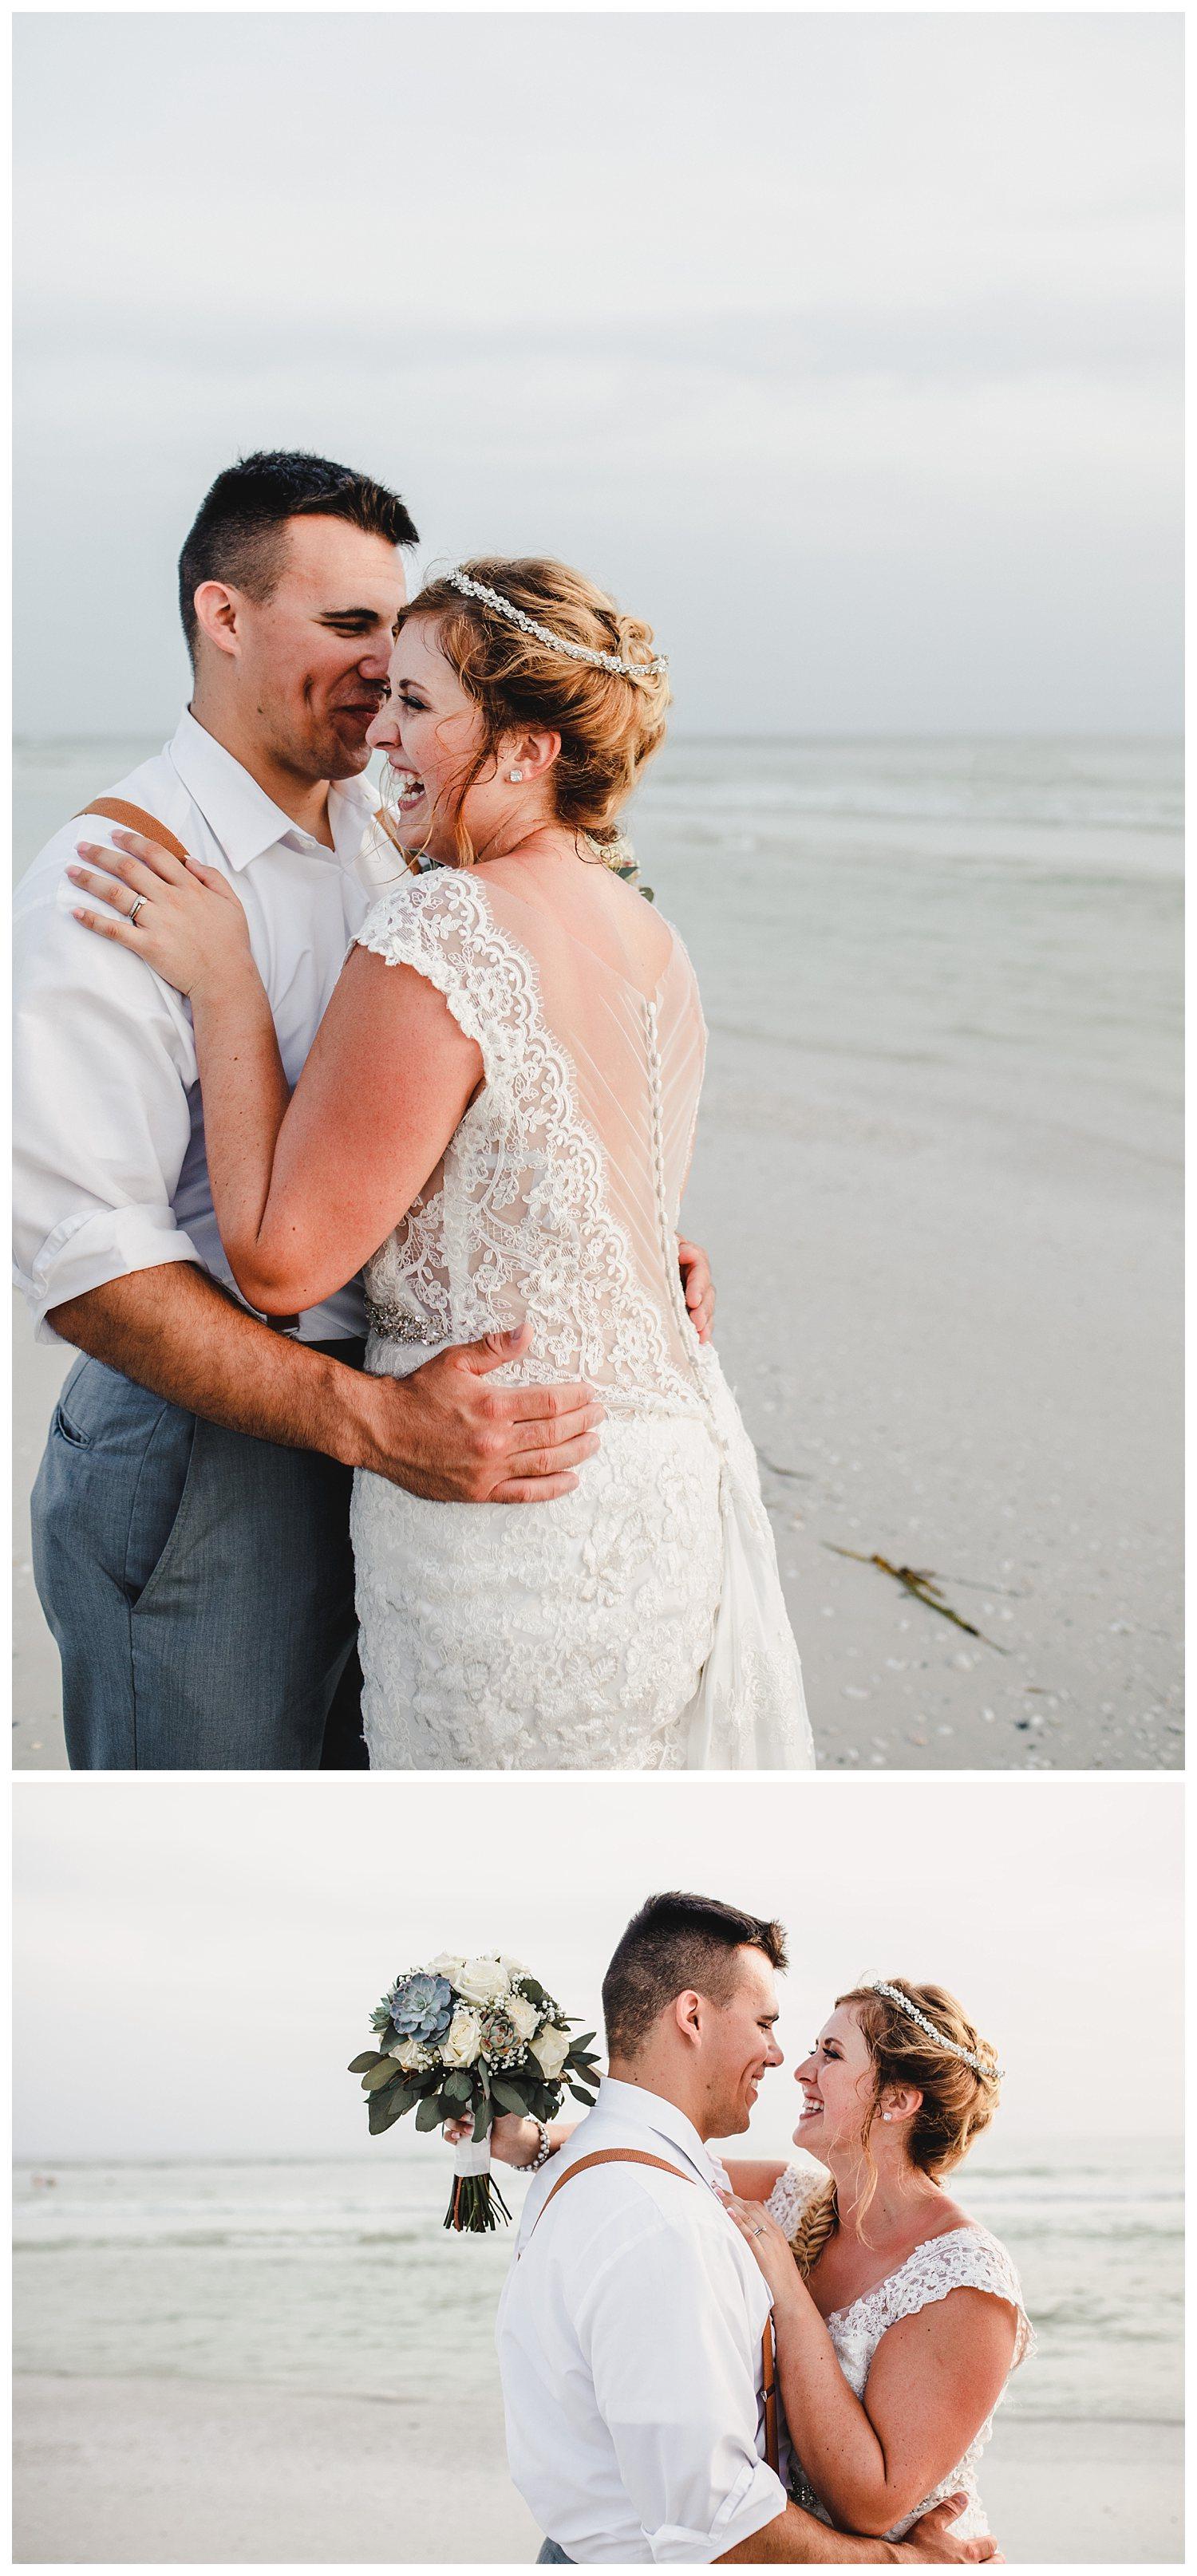 Kelsey_Diane_Photography_Destination_Wedding_Sarasota_Florida_Beach_Wedding_Alex_Austin_0680.jpg